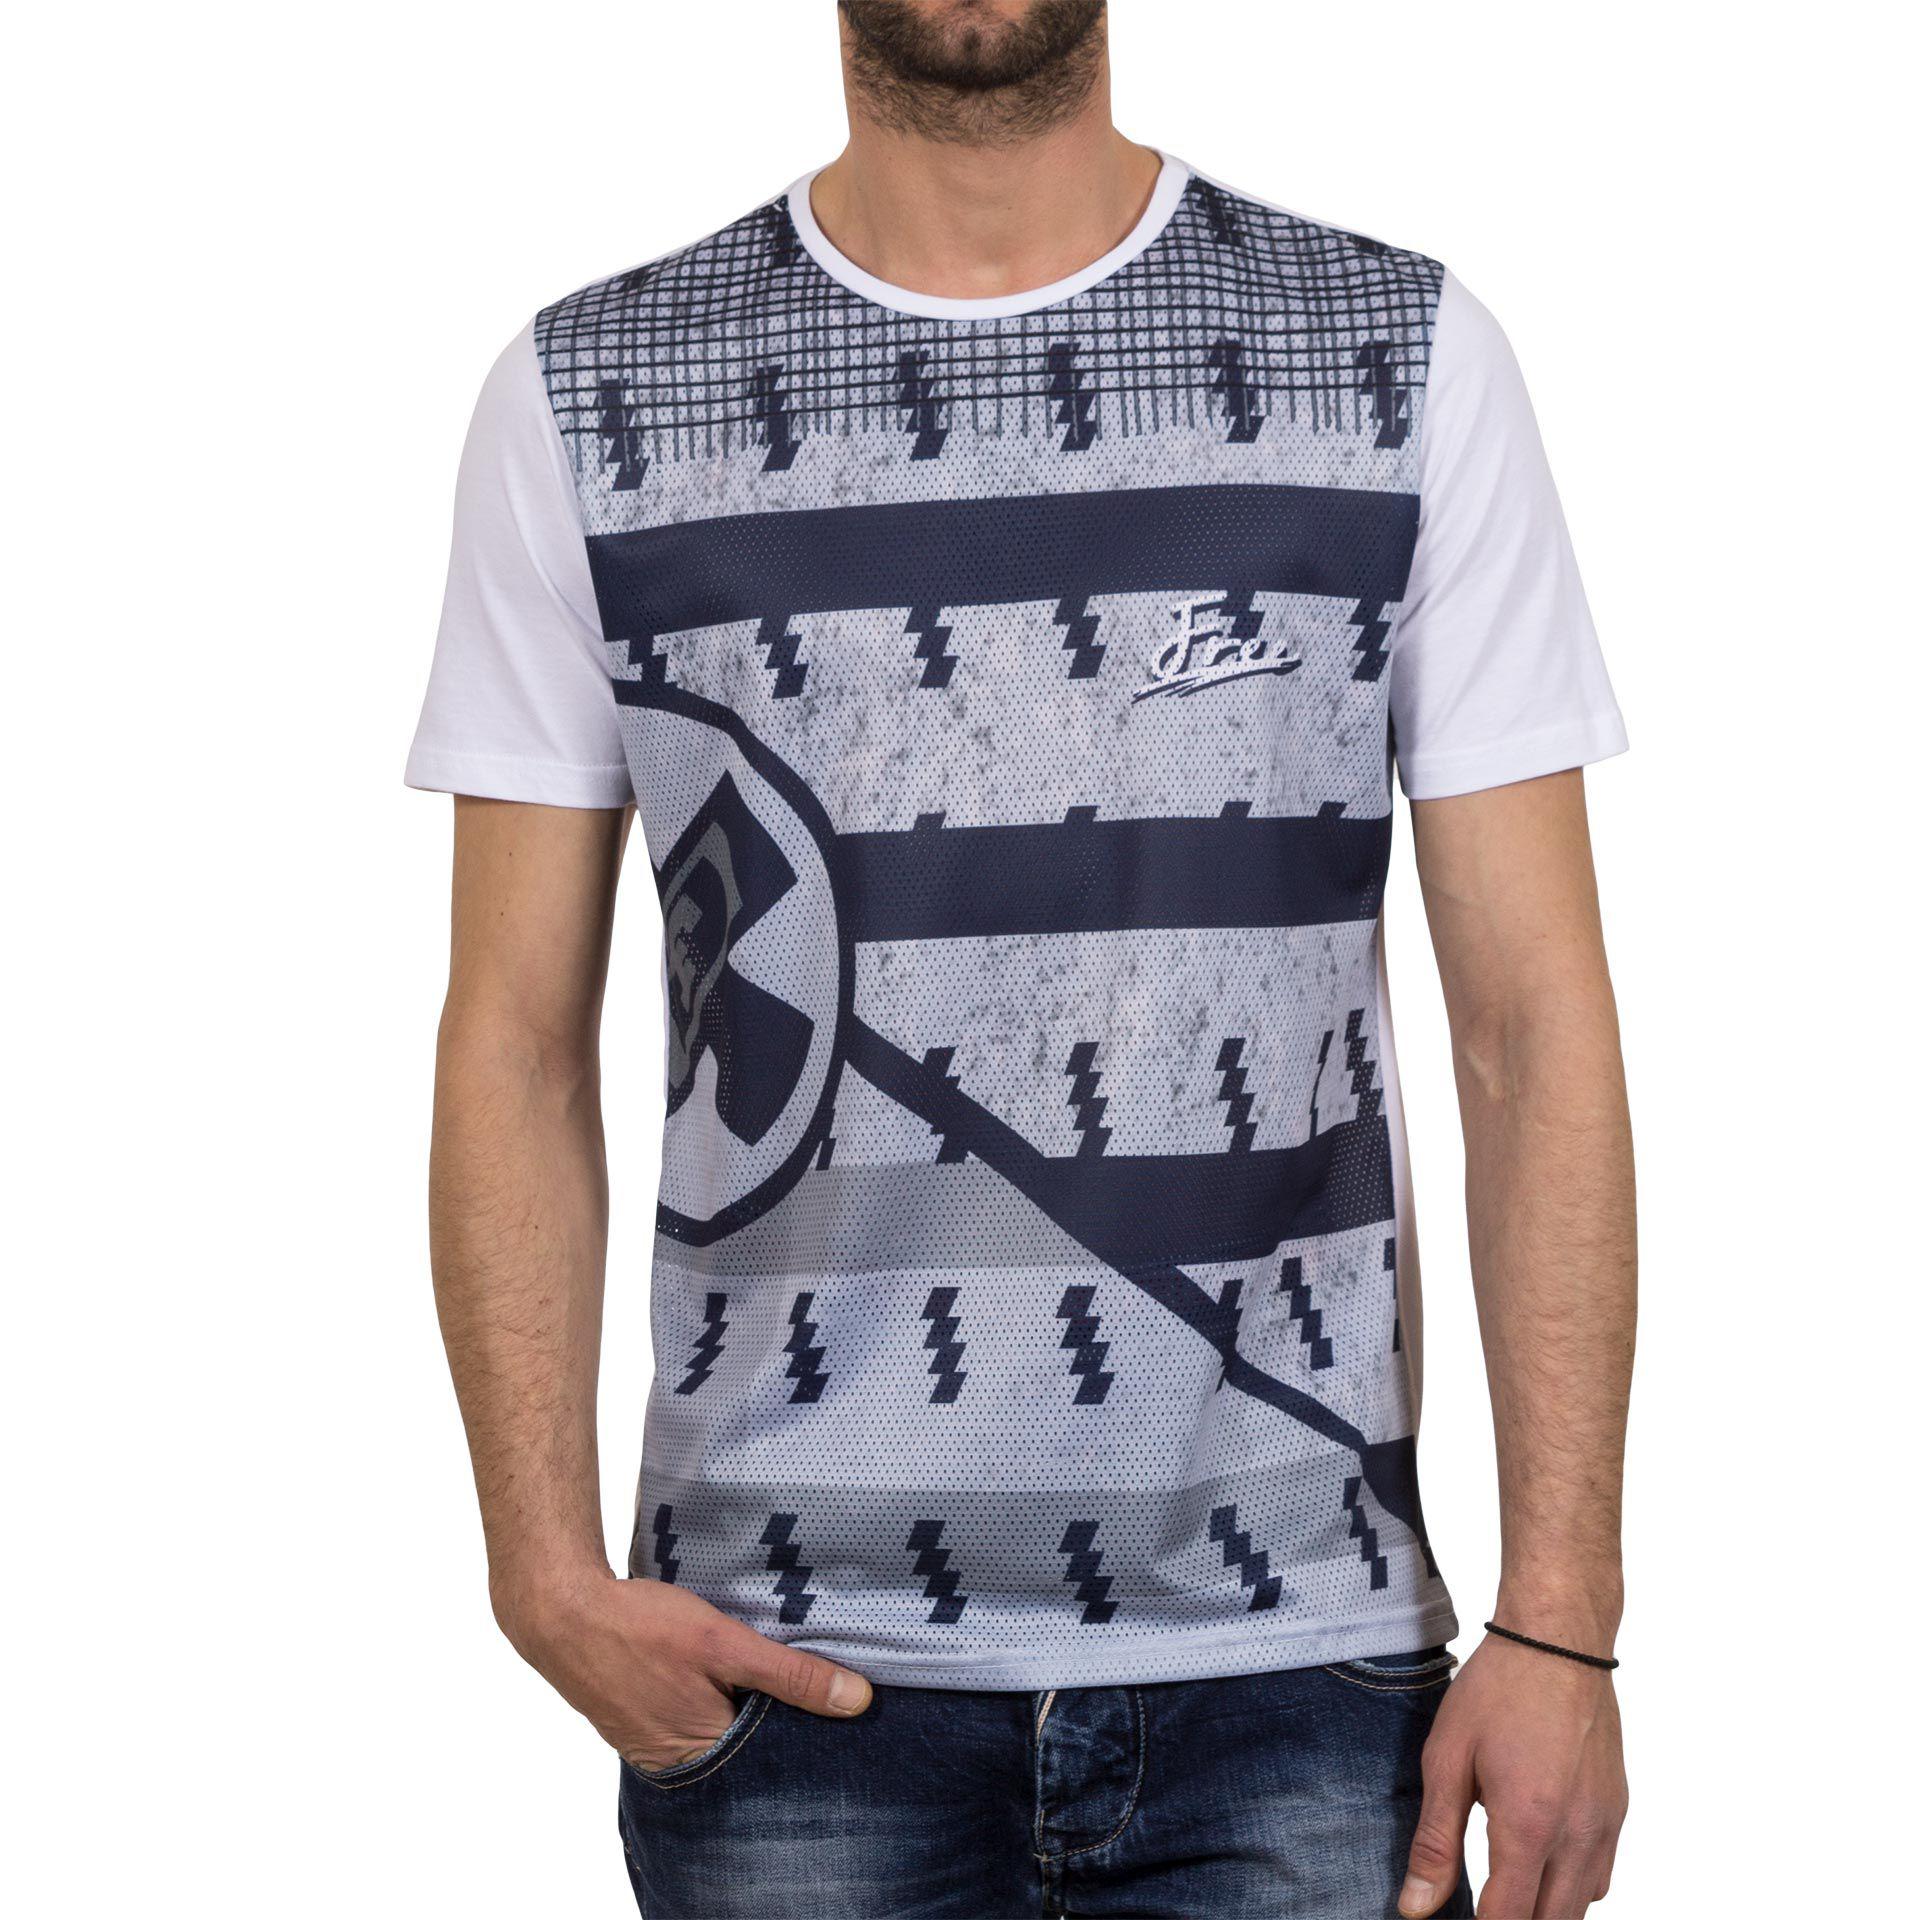 7ae3c9601d8f Ανδρική μπλούζα T-Shirt FreeWave Άσπρο Free